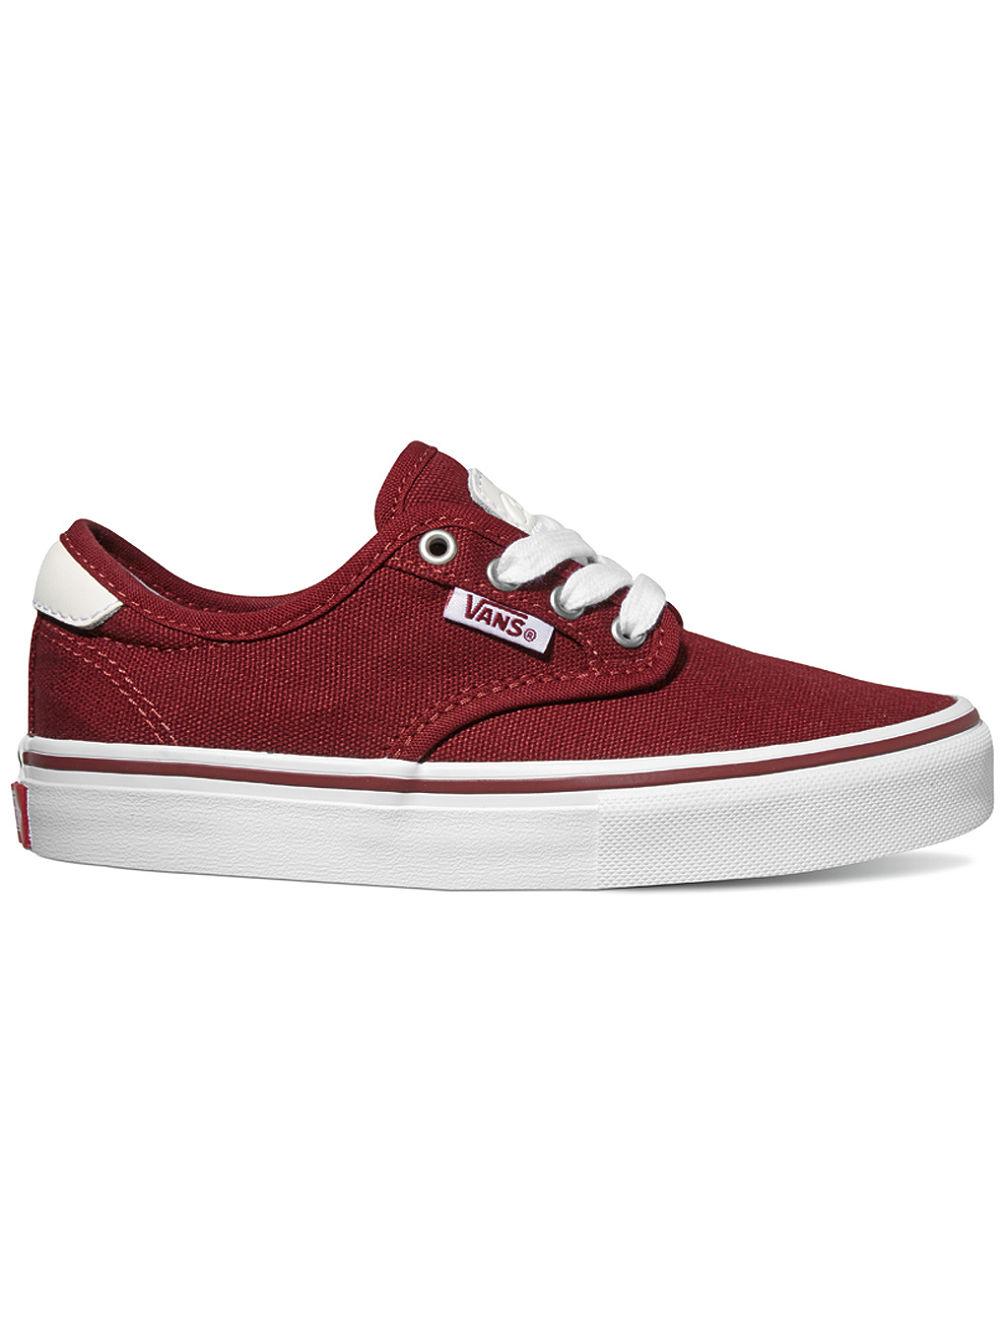 Buy Vans Chima Ferguson Pro Skate Shoes Boys online at blue-tomato.com aa4ec4c45a